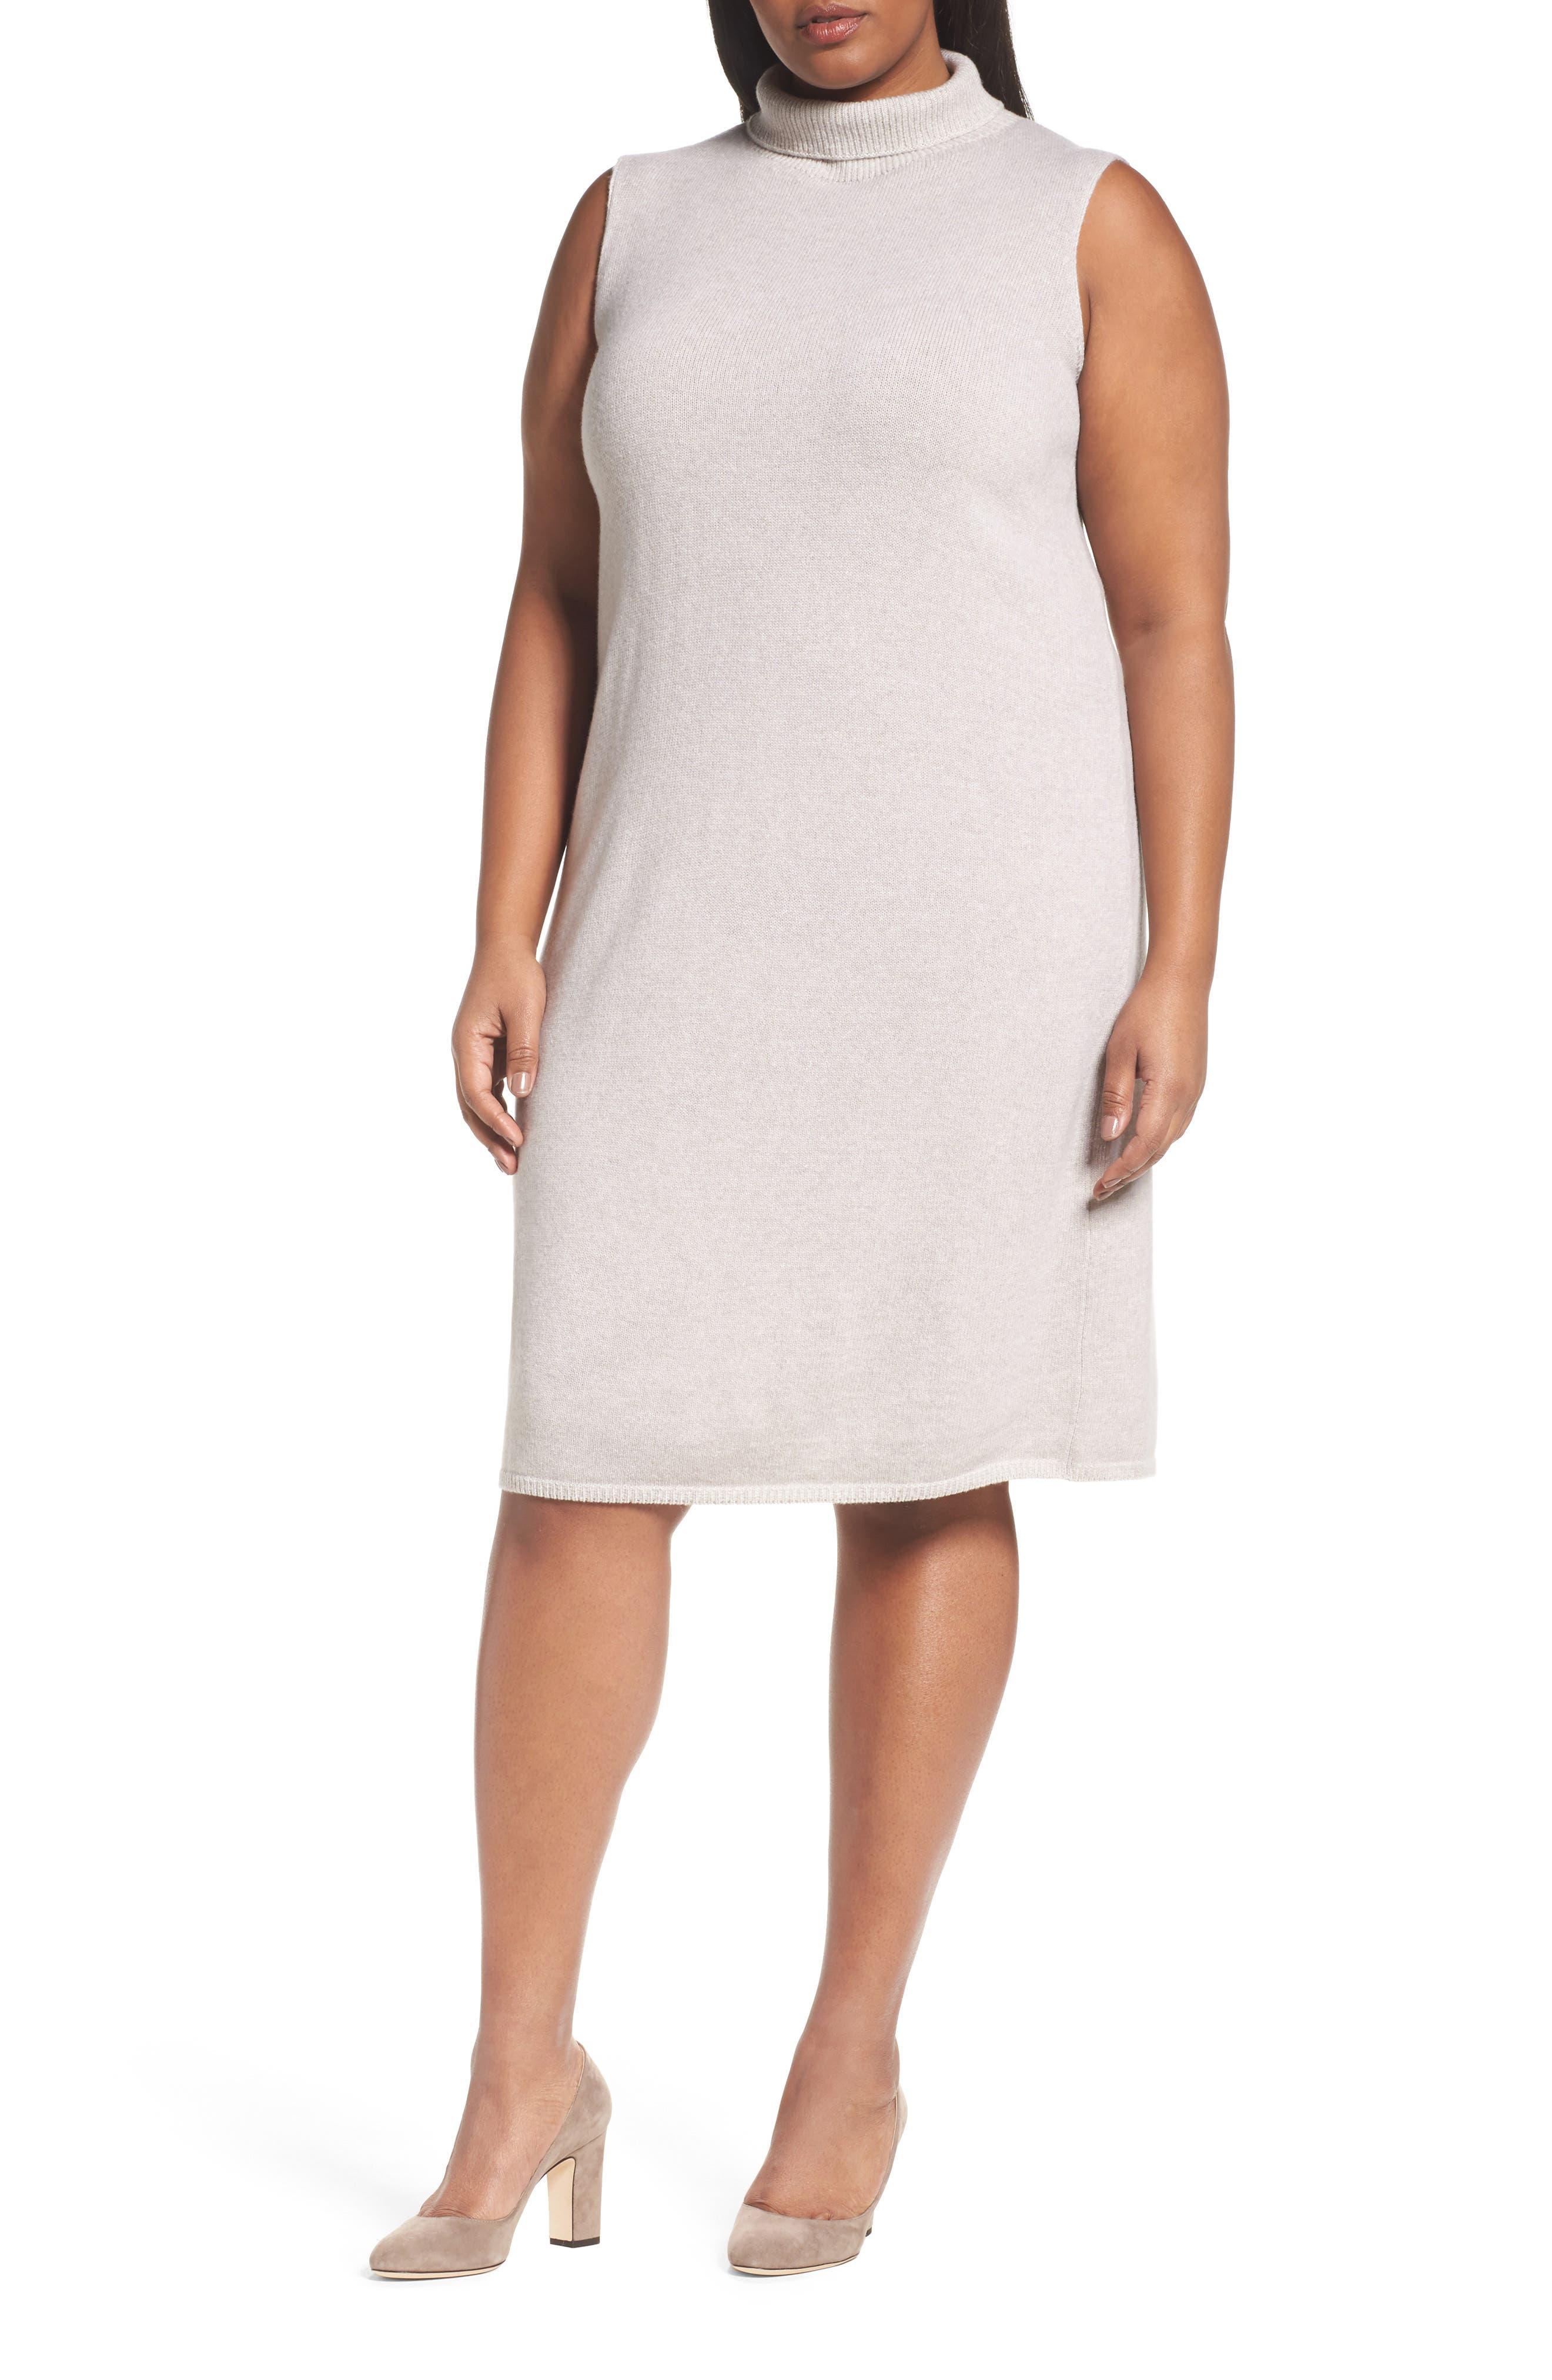 Main Image - Lafayette 148 New York Vanise Merino Wool & Cashmere Sweater Dress (Plus Size)